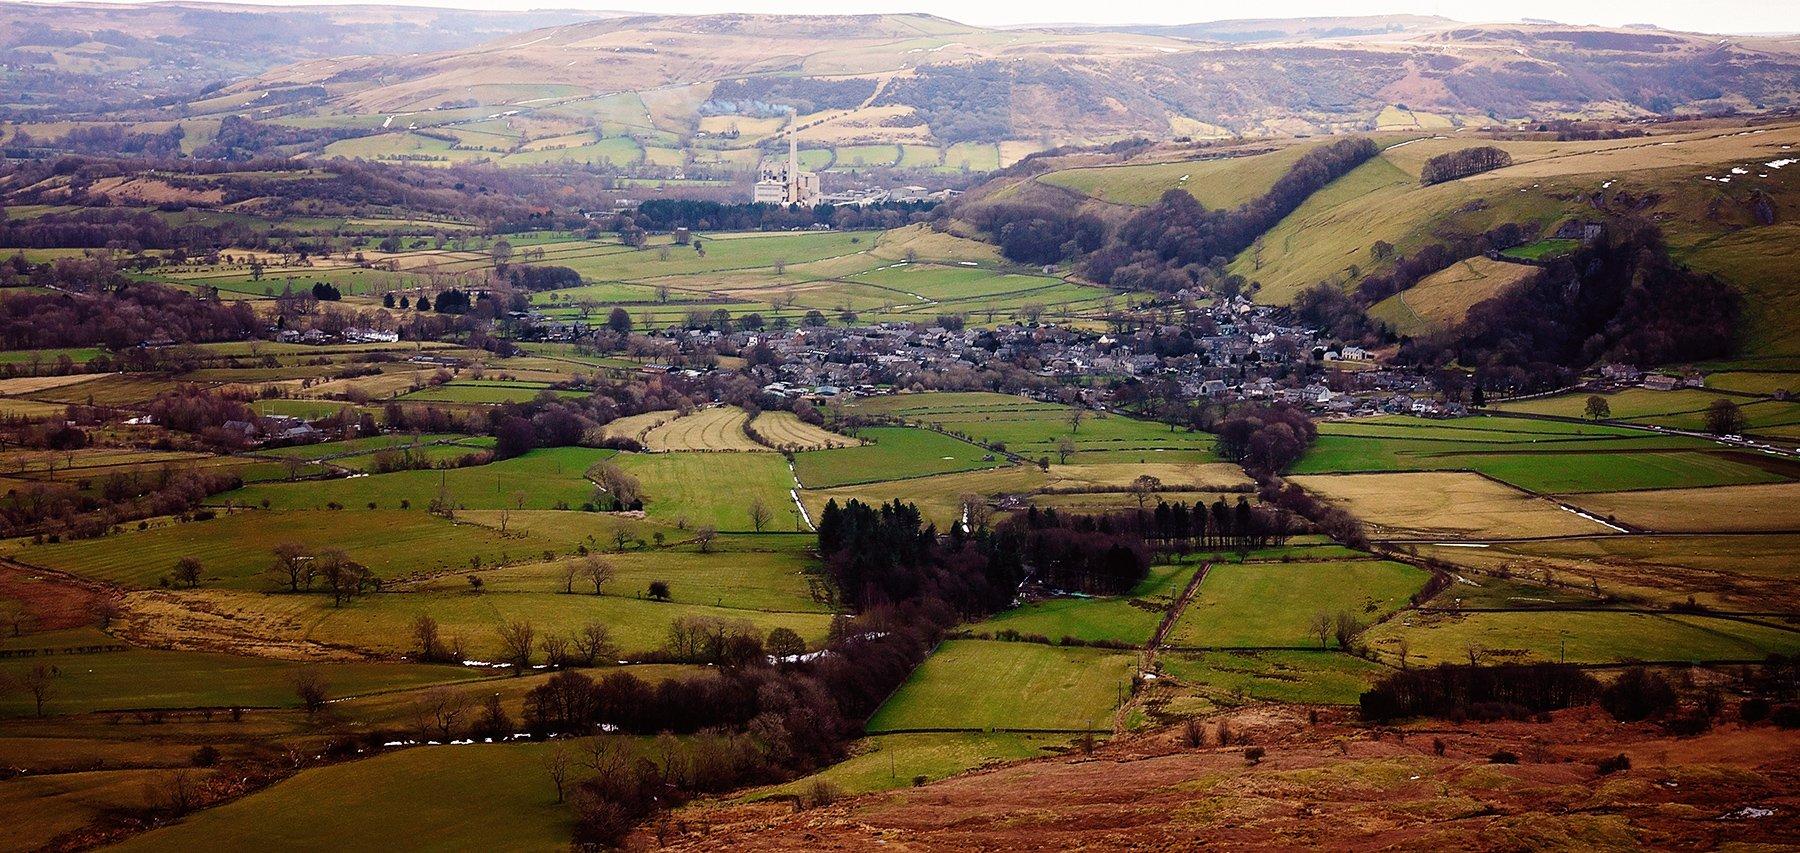 Views over Castelton with Peveril Castle.